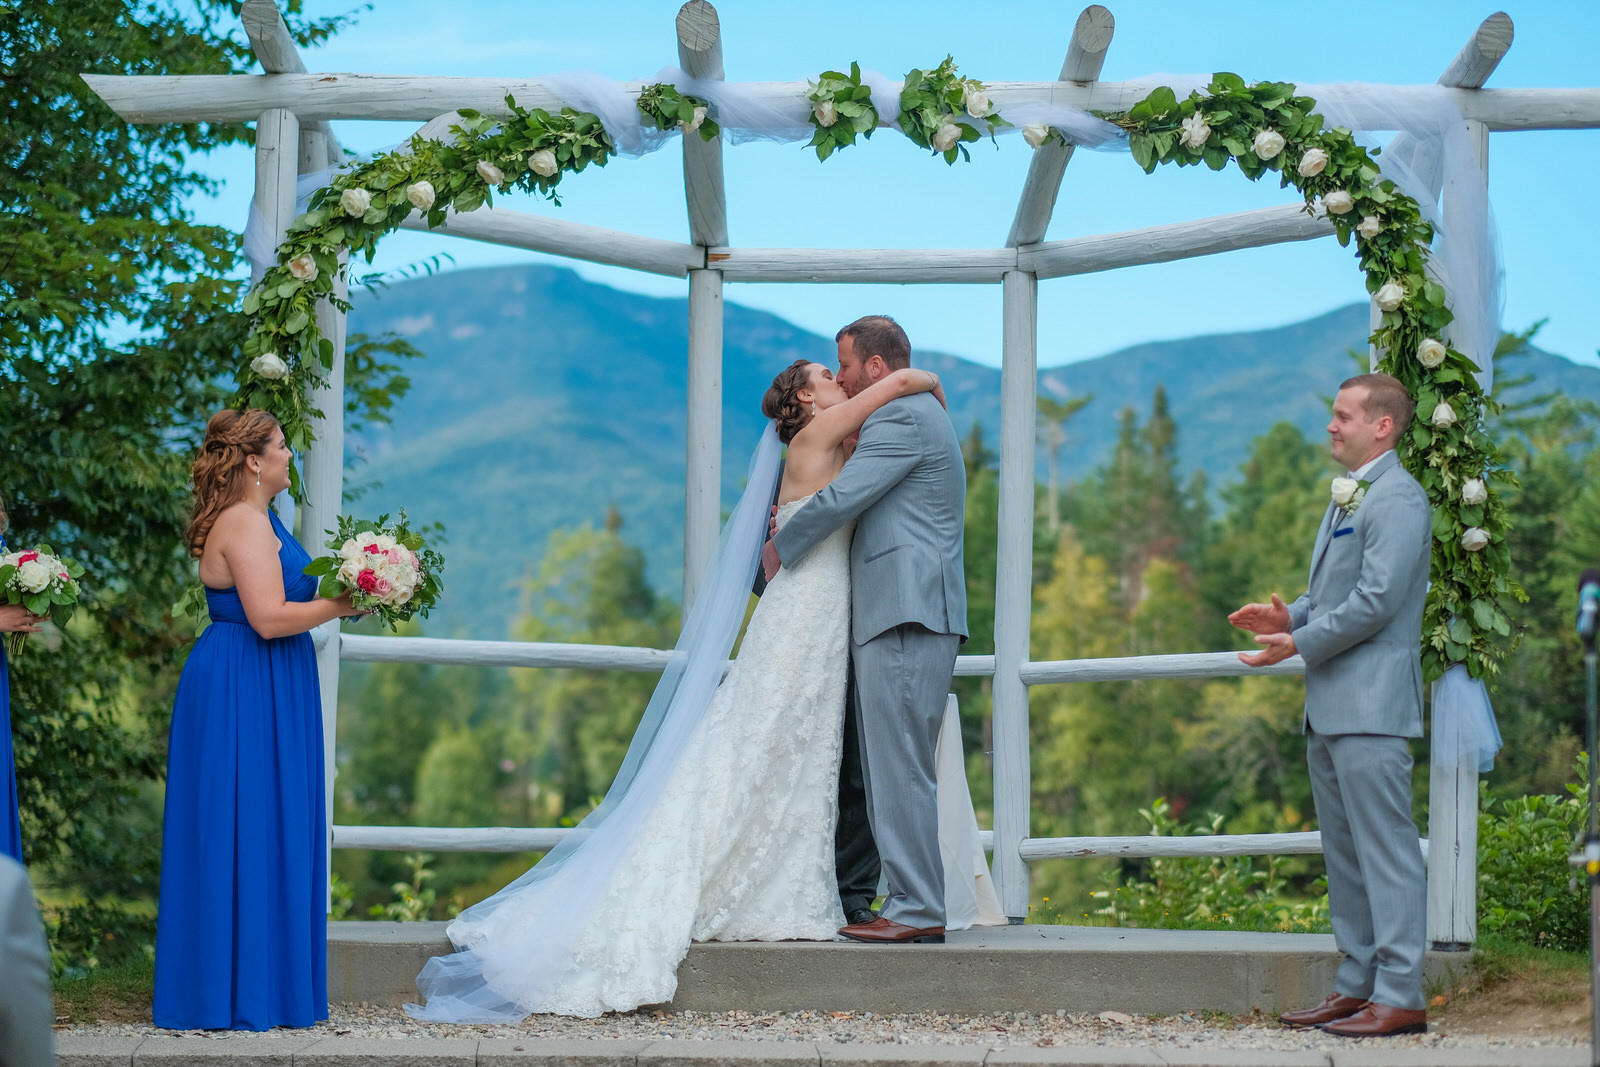 waterville-valley-wedding-photography-695.jpg